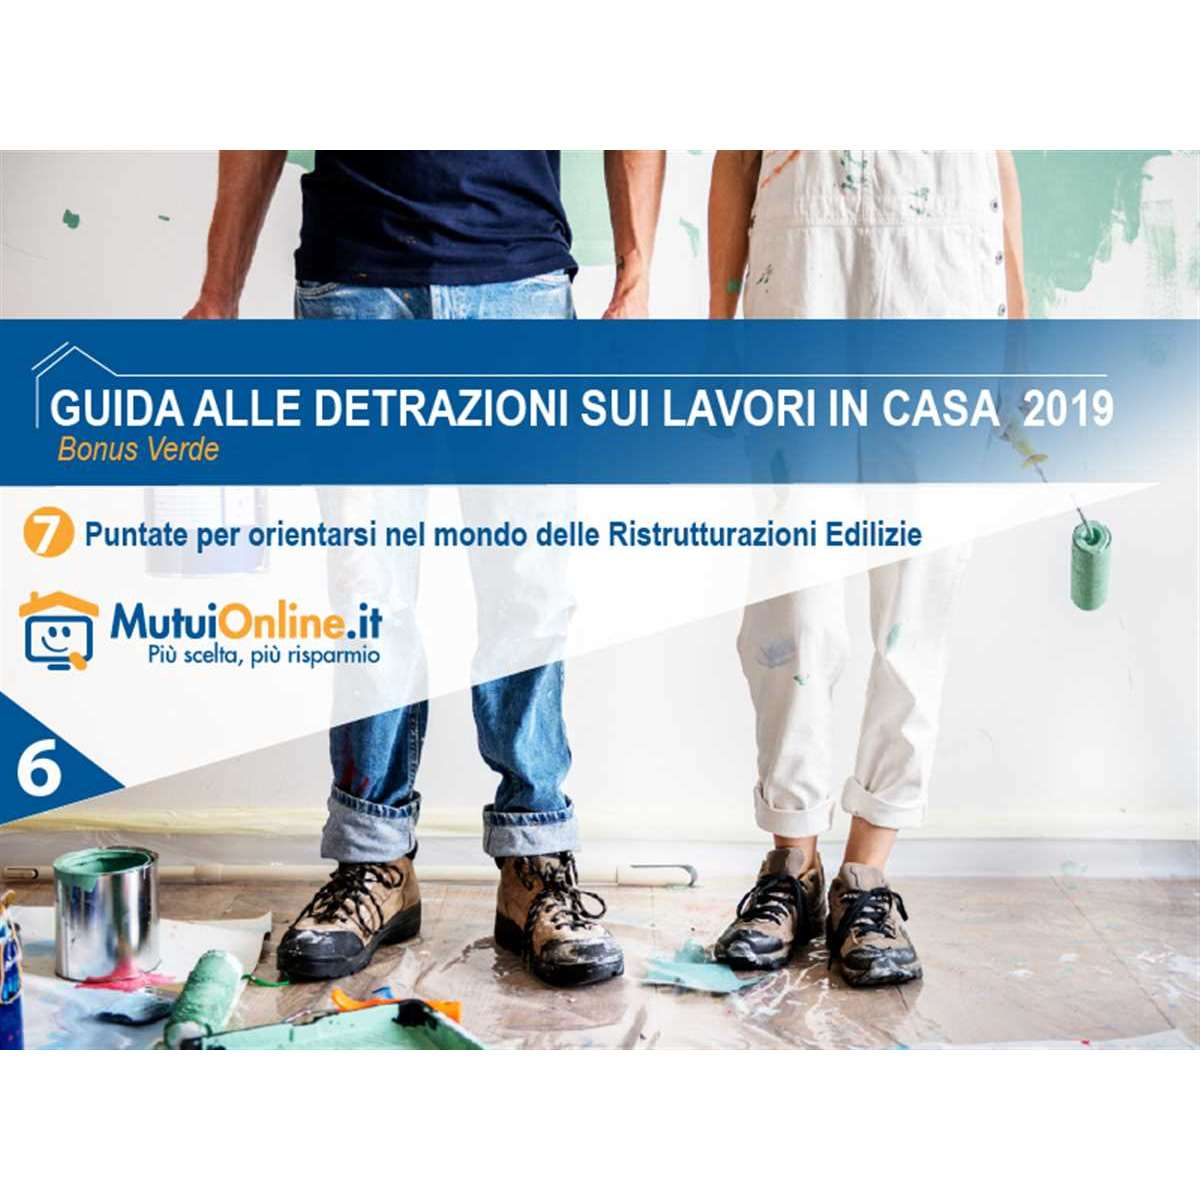 Legge Bonus Verde 2018 guida alle detrazioni sui lavori in casa 2019: il bonus